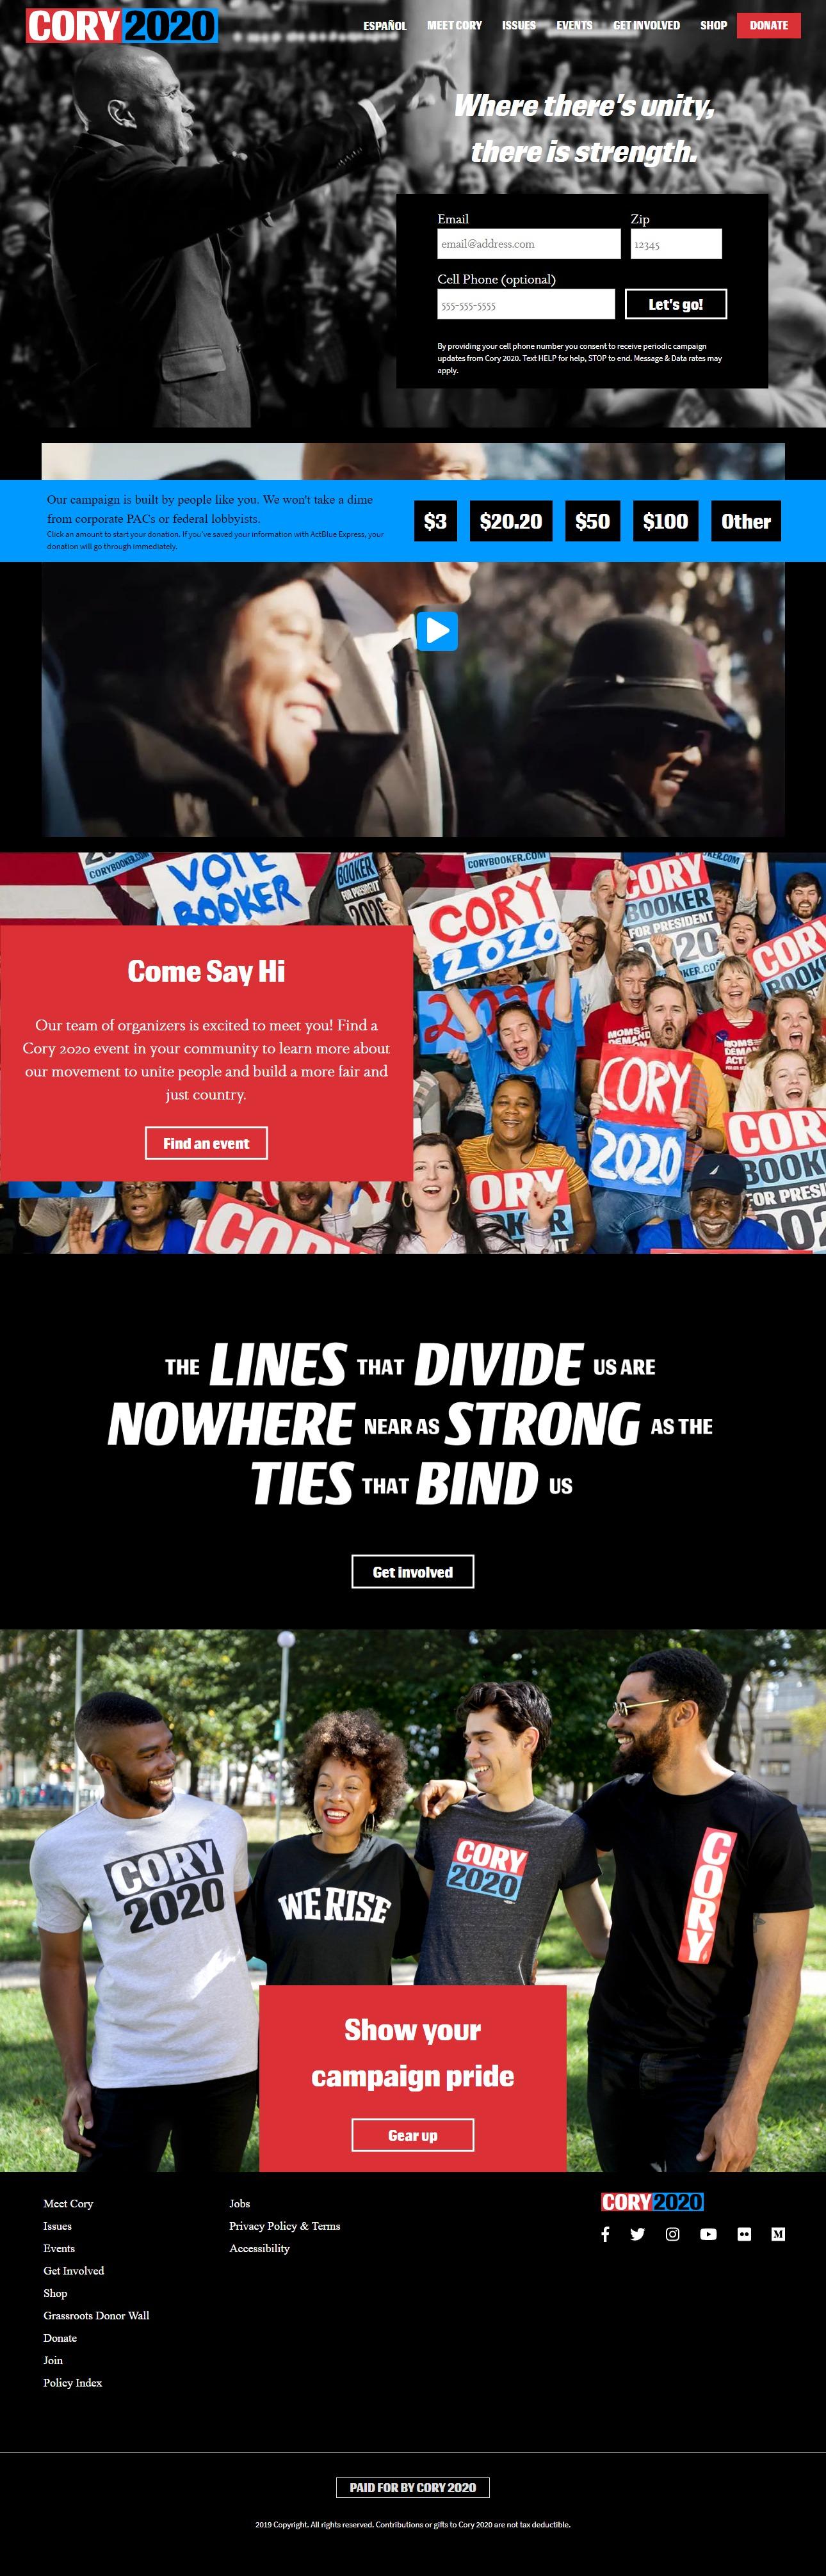 Homepage Snapshot for January 1, 2020: Senator Cory Booker